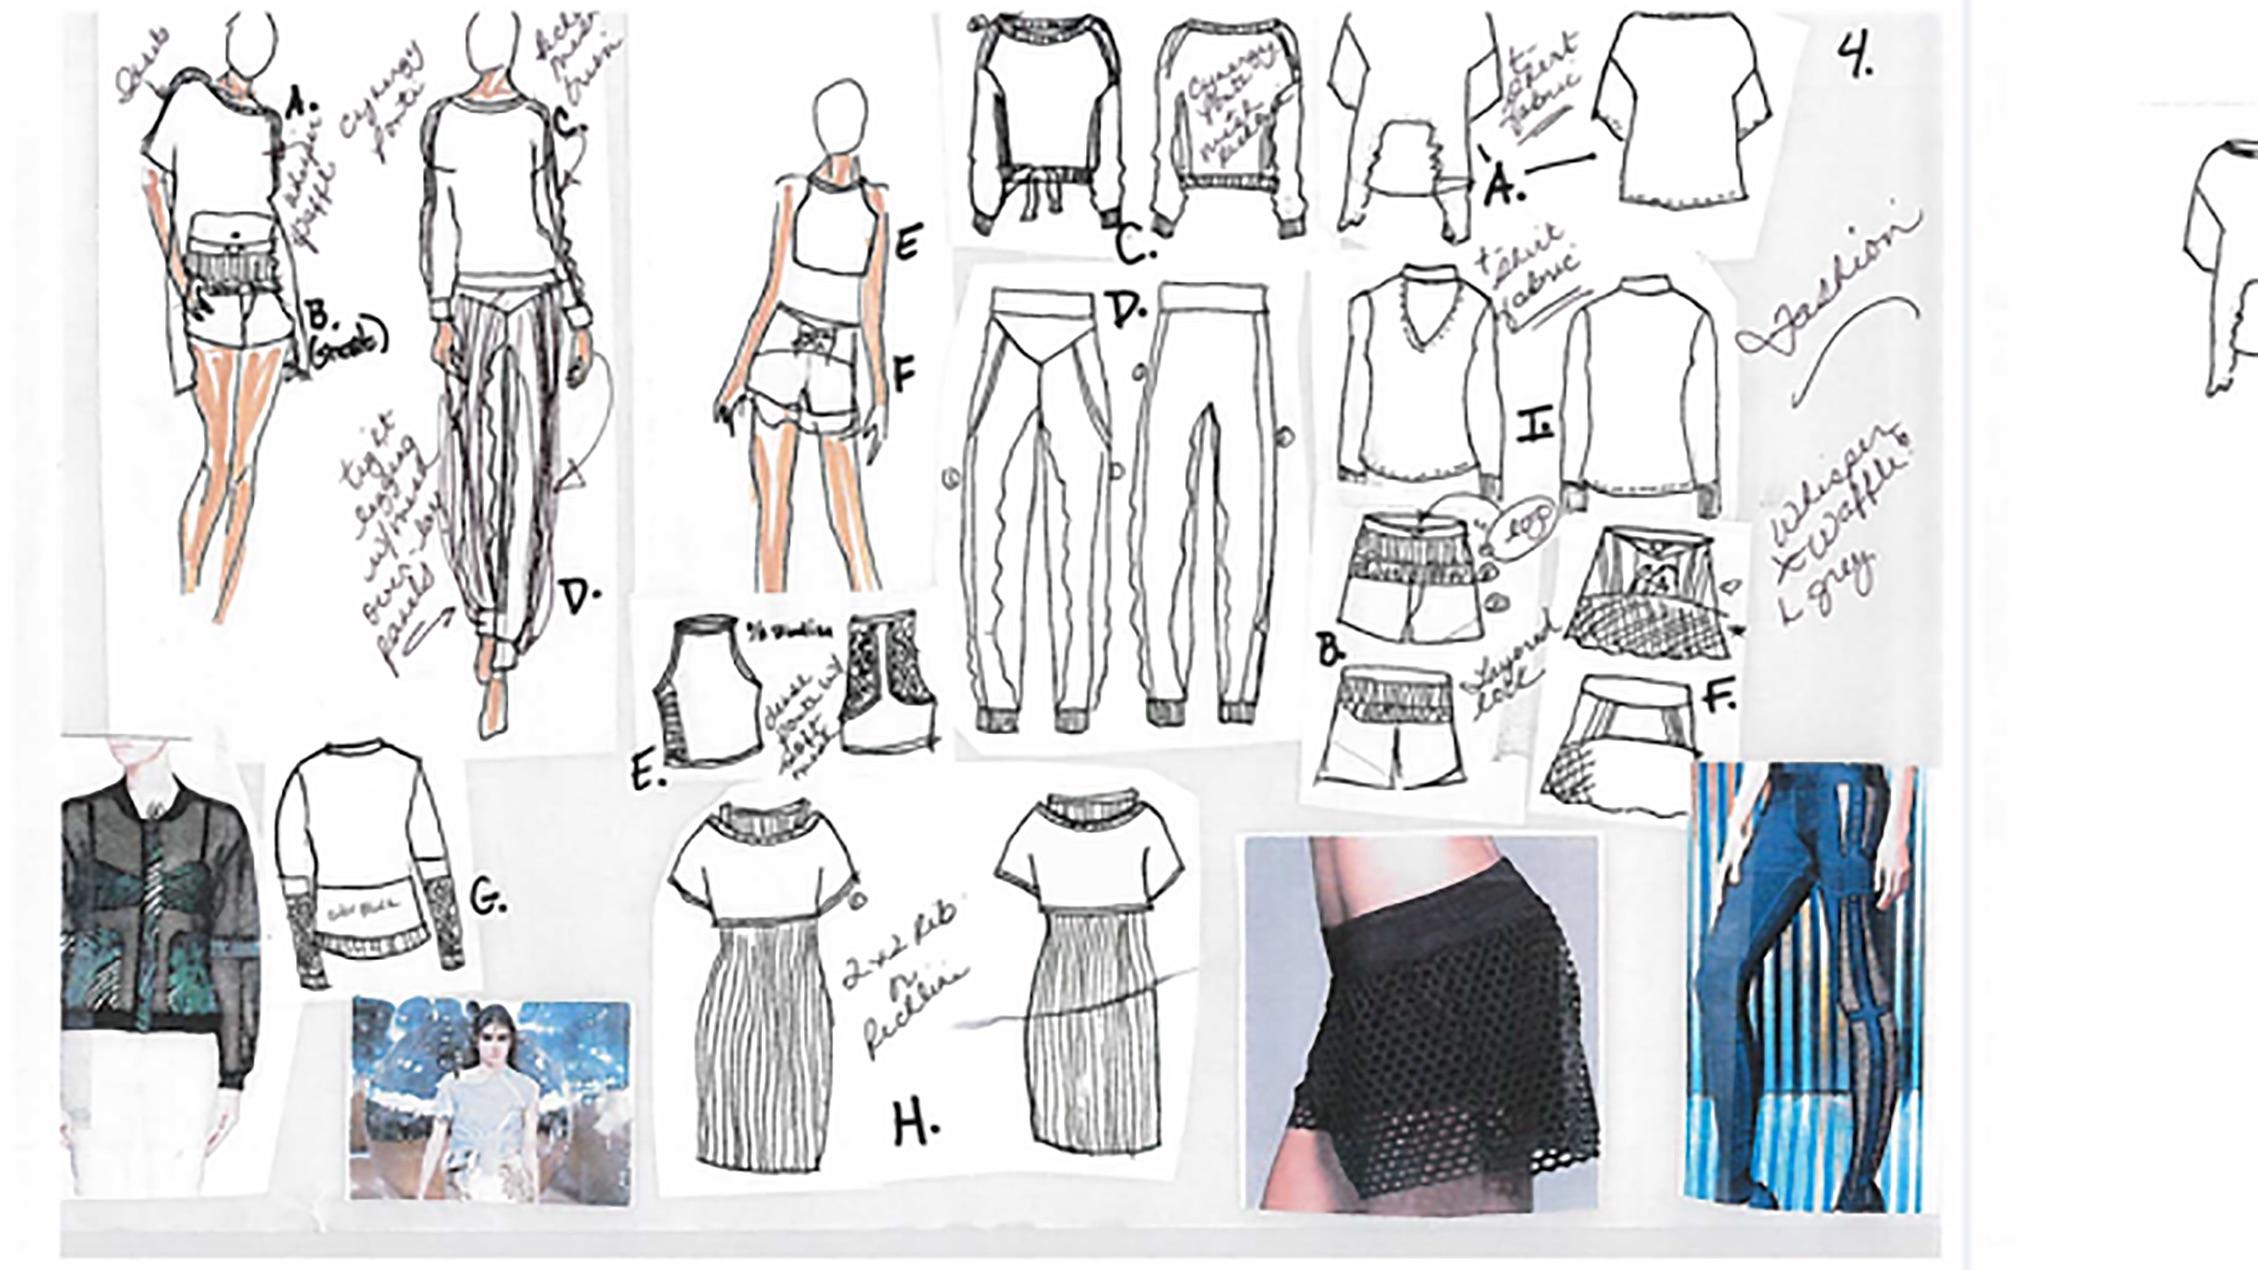 Tennis Star Venus Williams is Also a Fashion Designer